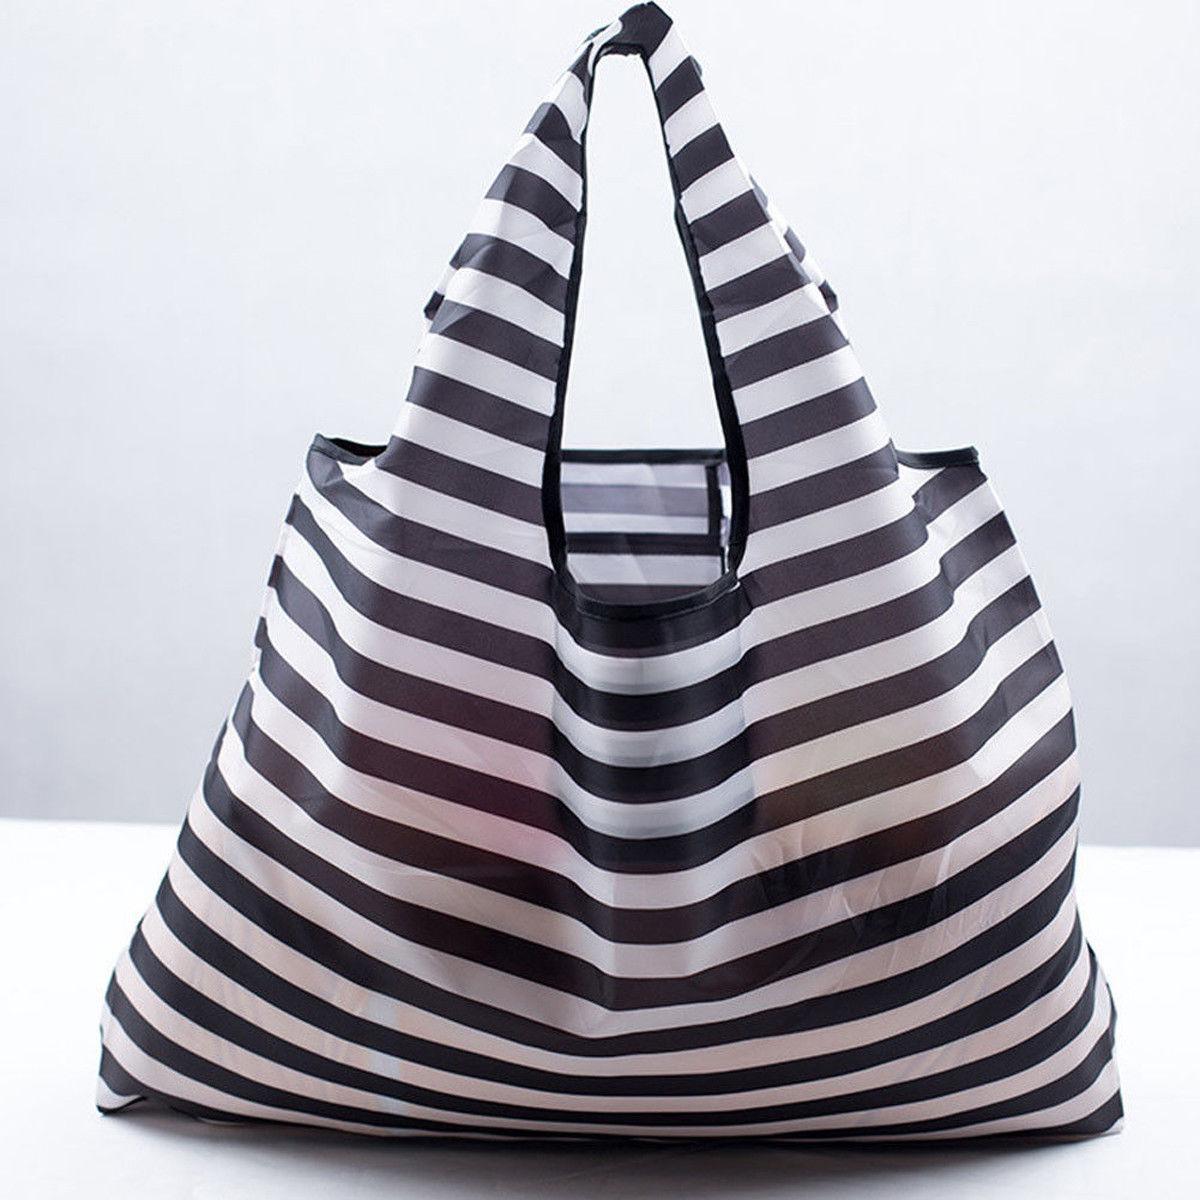 Fashion Shopping Bag Large Capacity Recyclable Reuse Oxford Cloth Tote Bag Cartoon Printing Waterproof Gift Bag